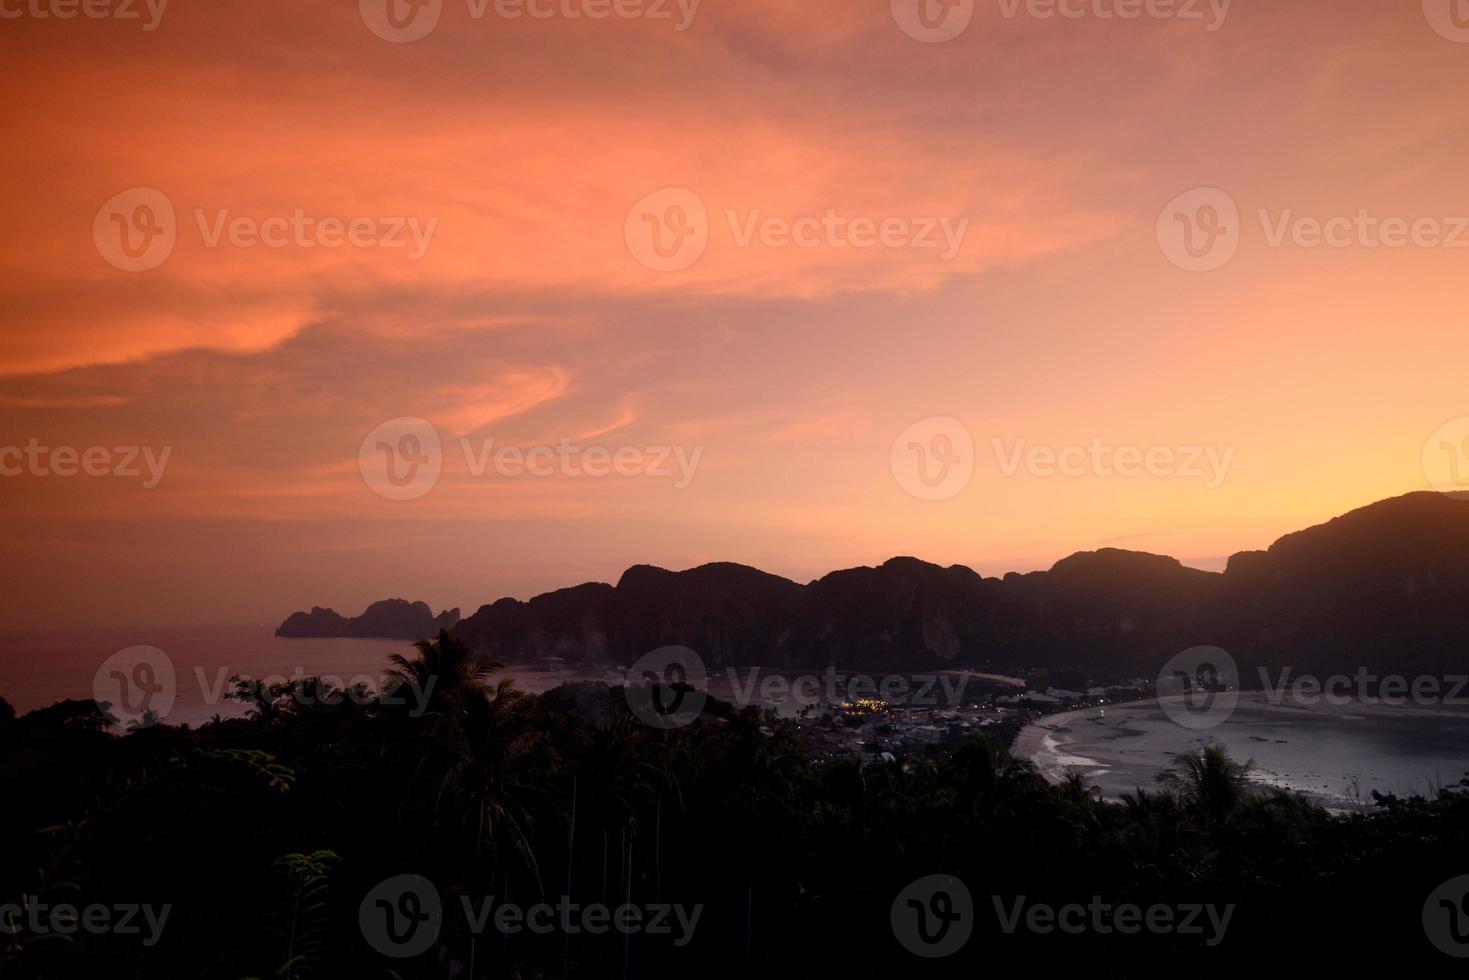 thailandia krabi phi phi islands foto